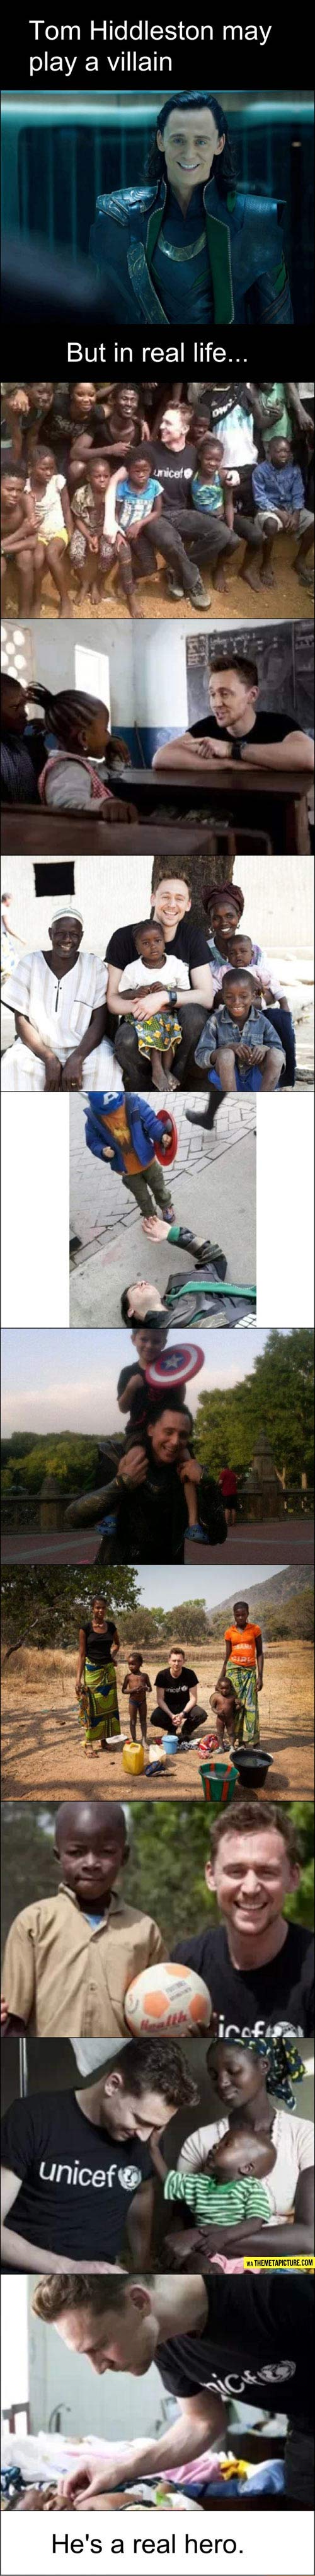 You're a good guy Tom Hiddleston…